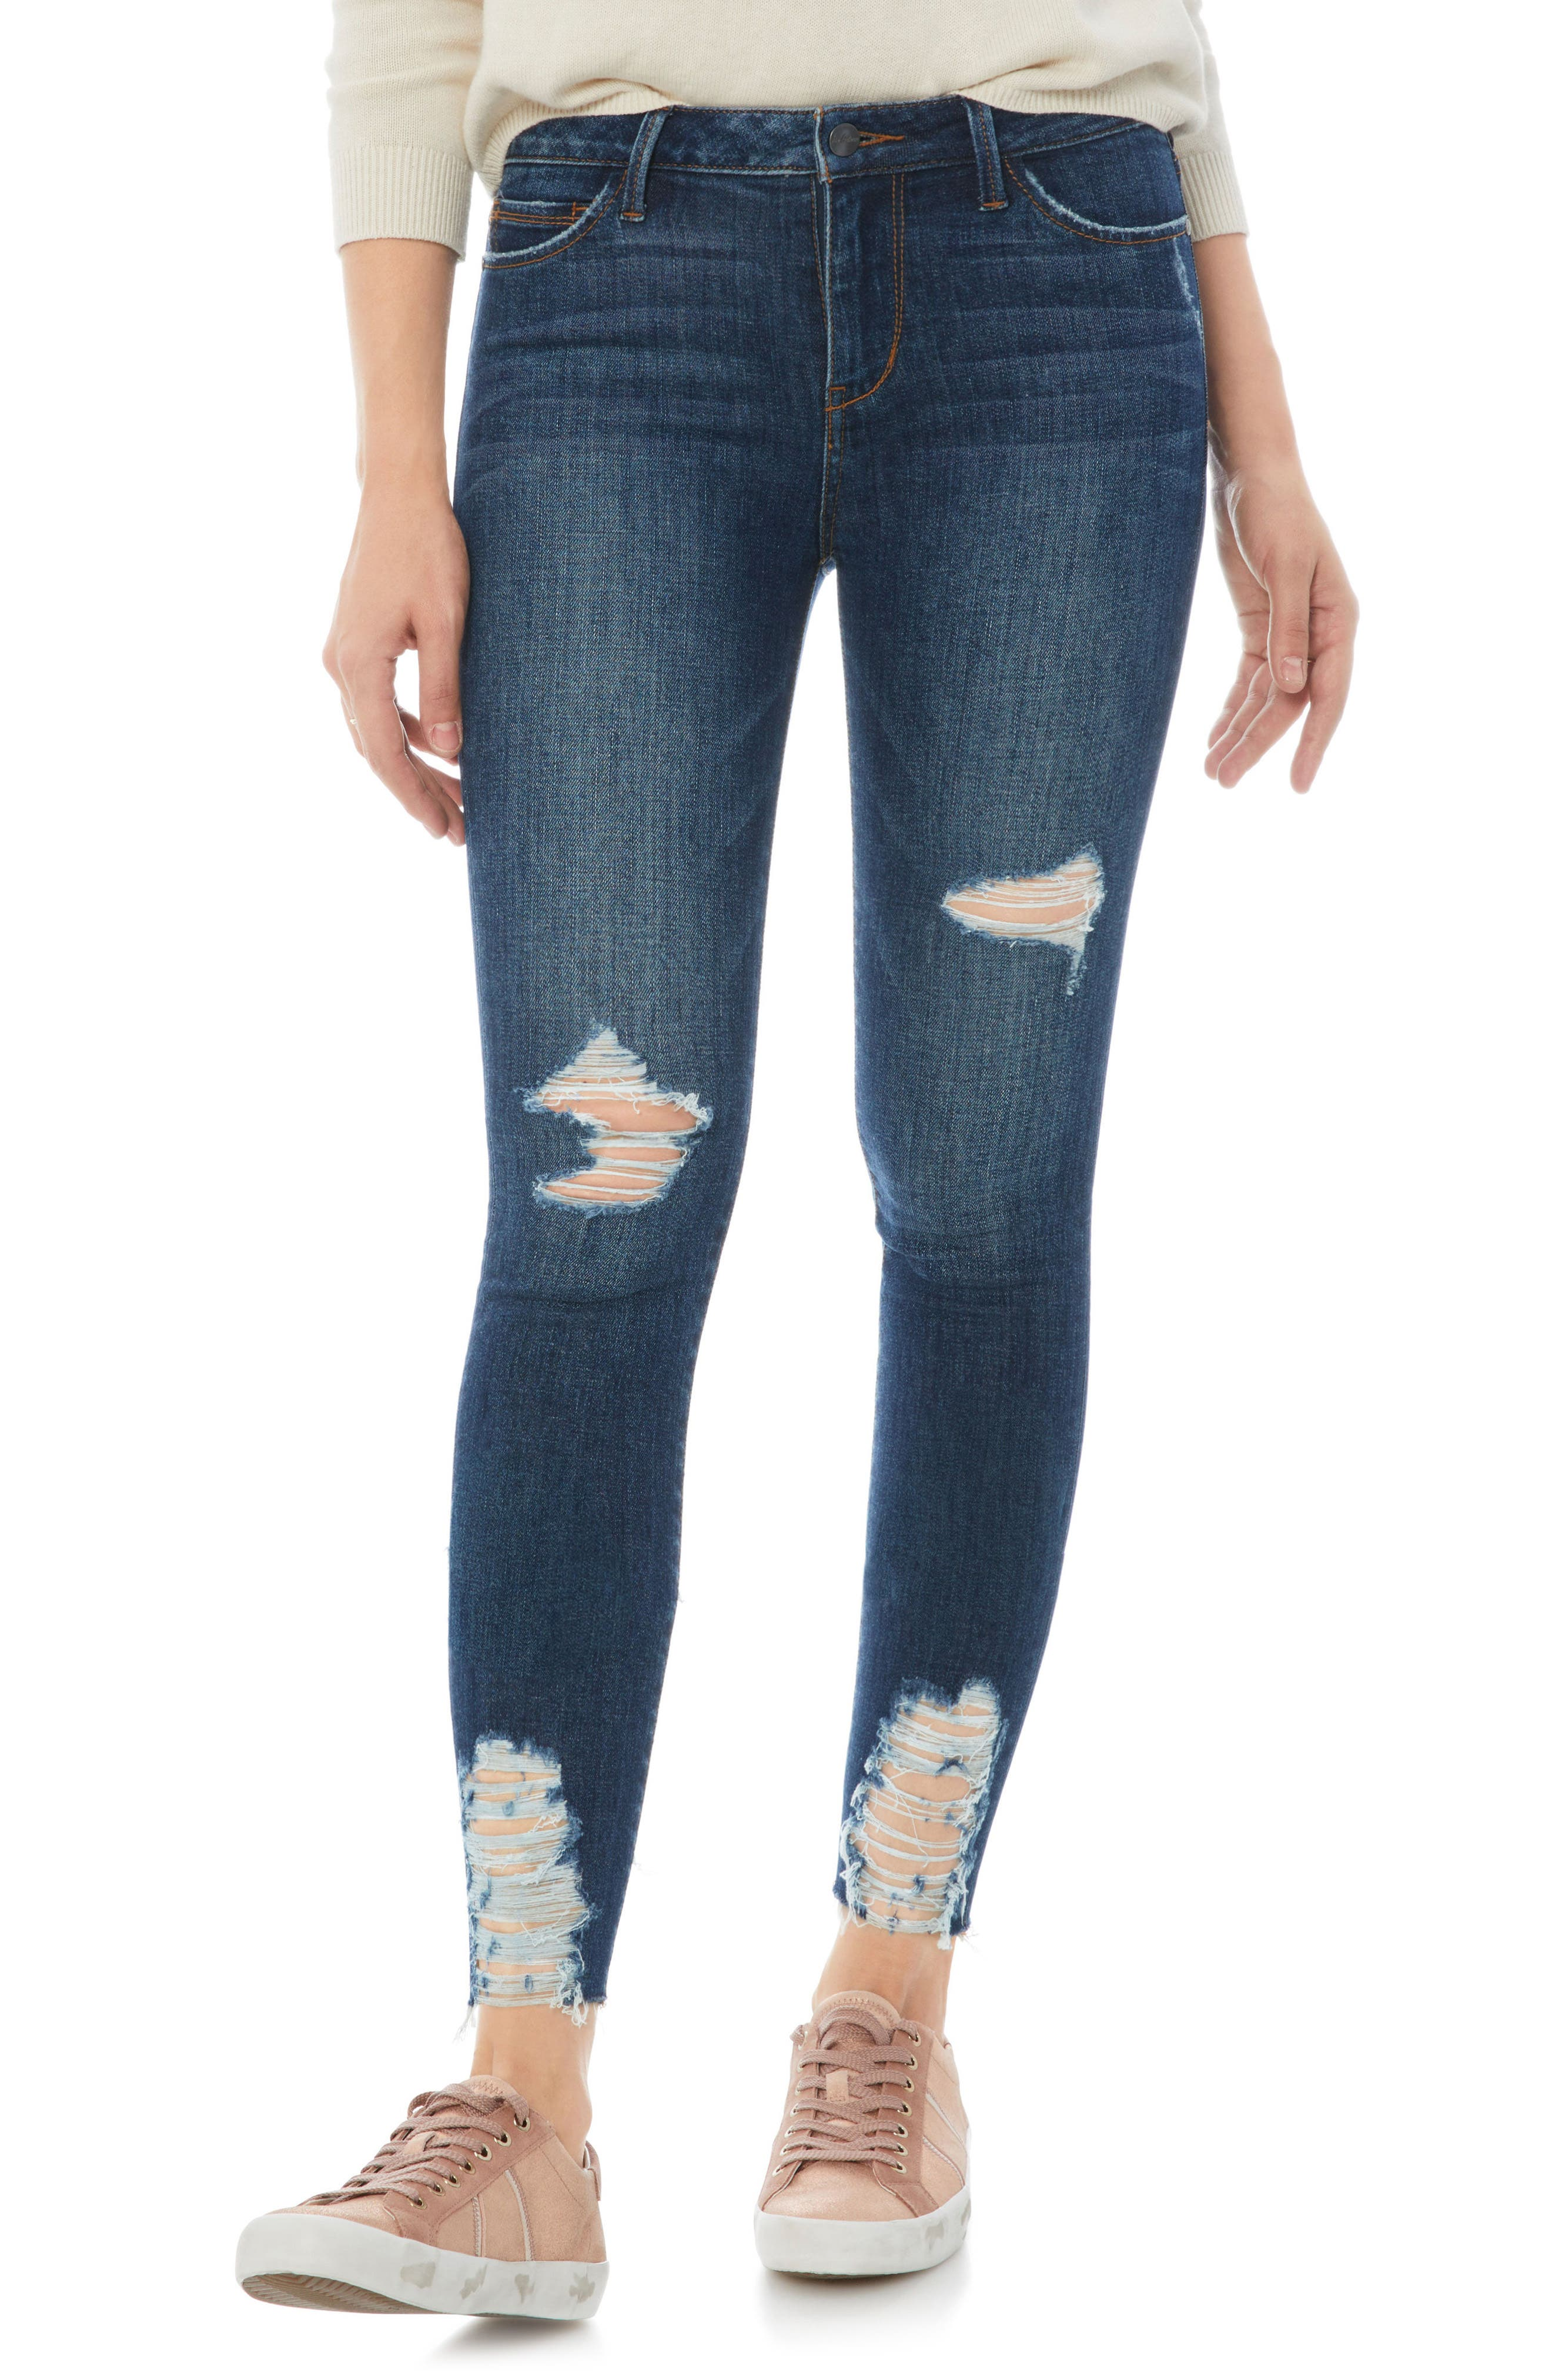 Alternate Image 1 Selected - Sam Edelman The Kitten Ripped Jeans (Margaux)